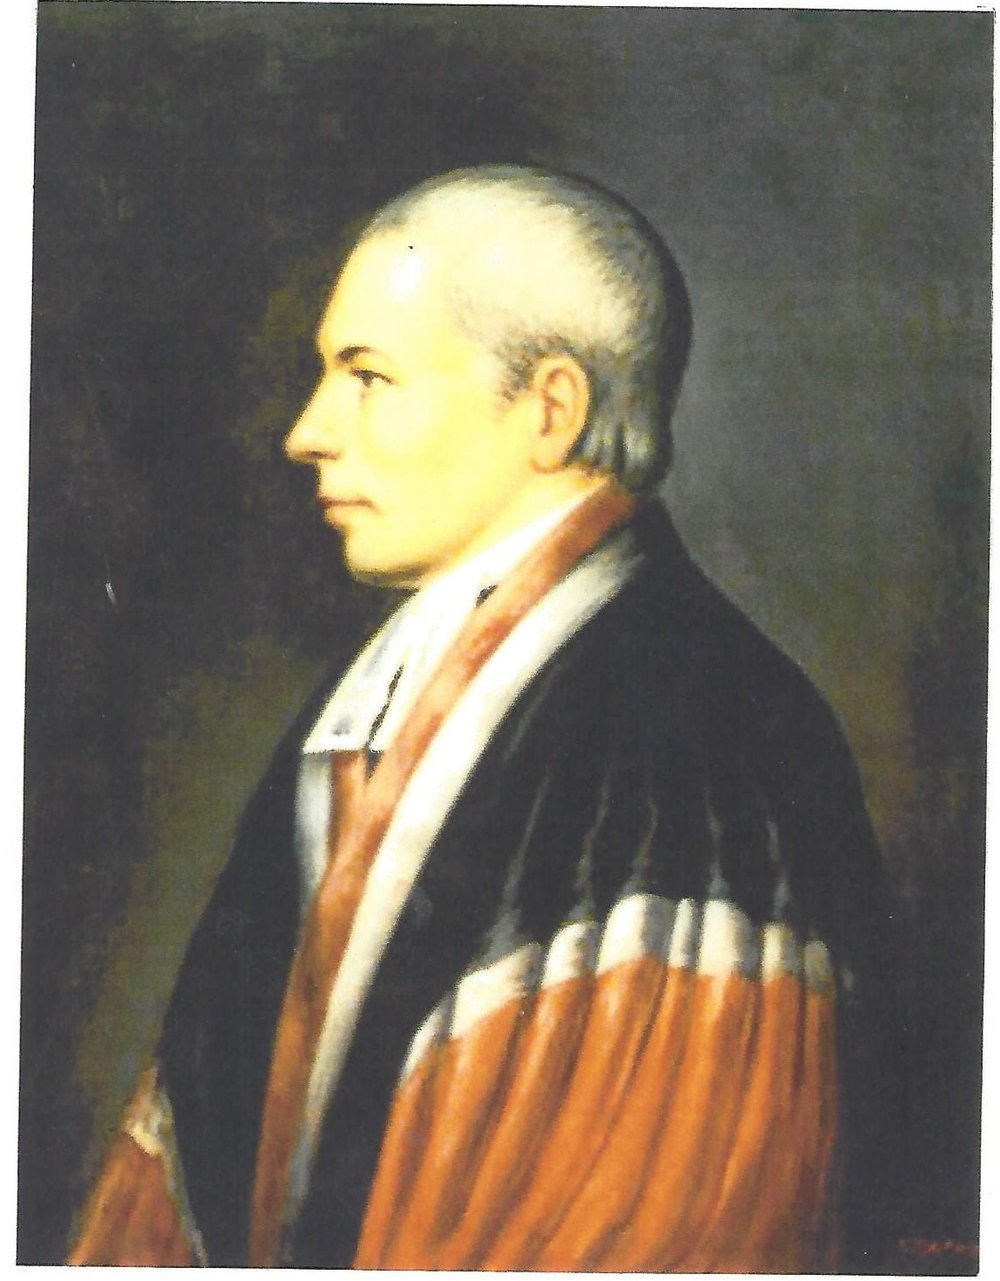 William Paterson, painted by James Sharples 1794 (National Portrait Gallery, Washington, D.C.